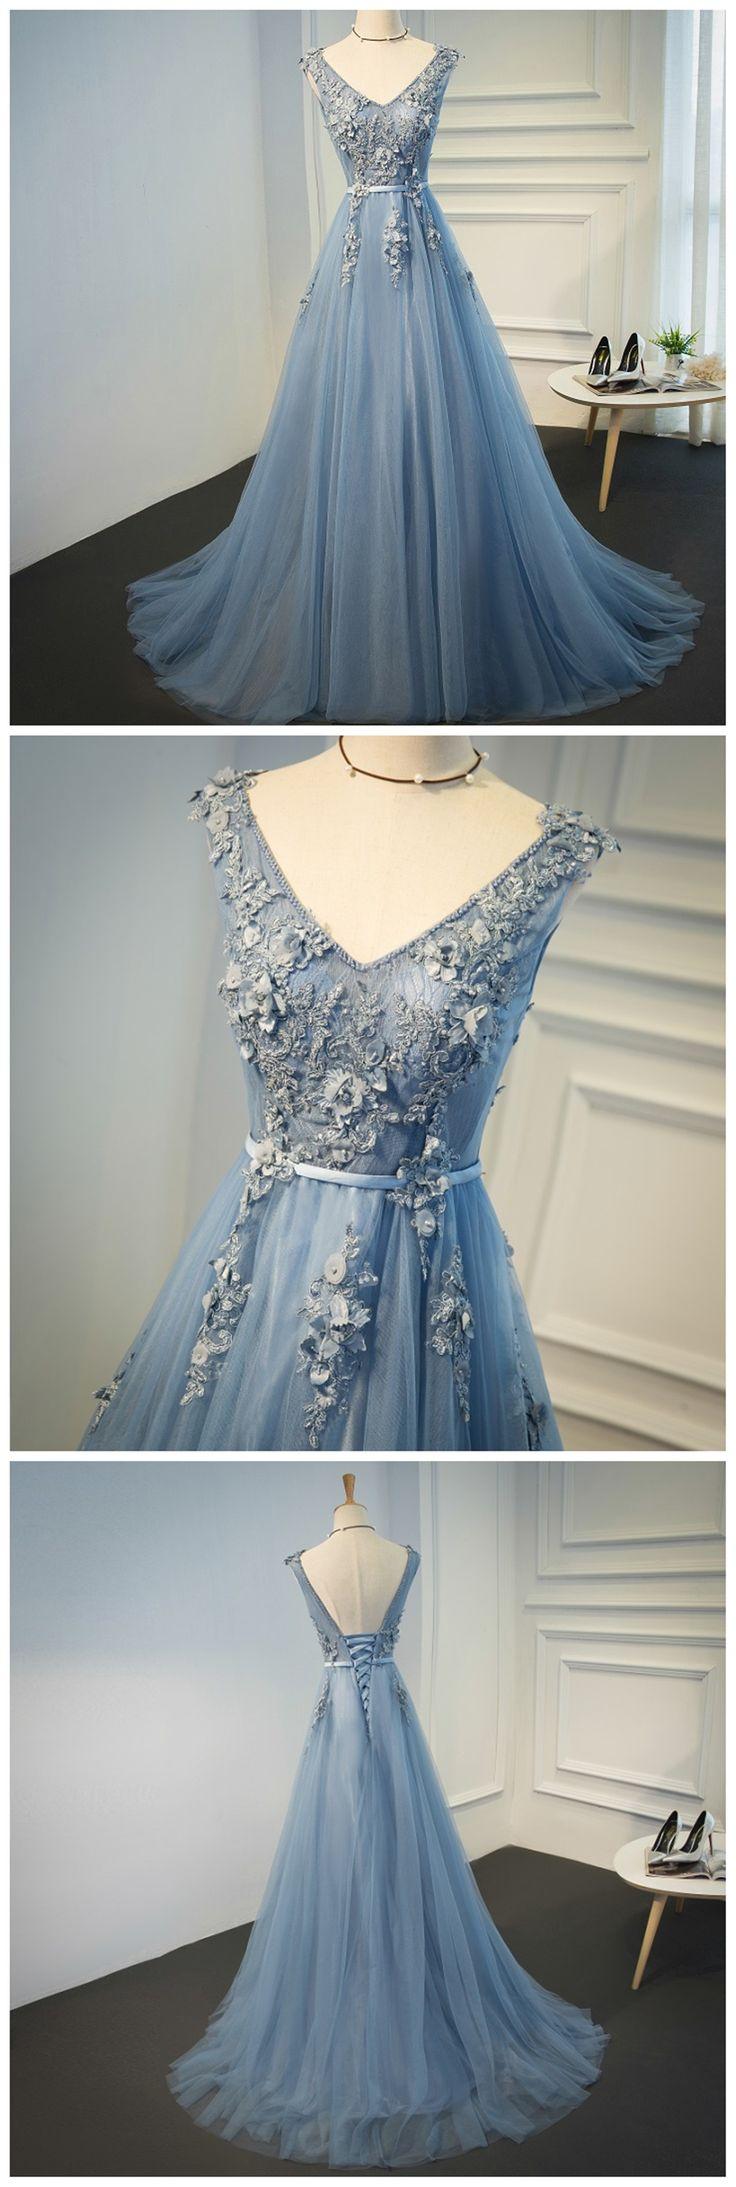 best long prom dresses images on pinterest cute dresses formal